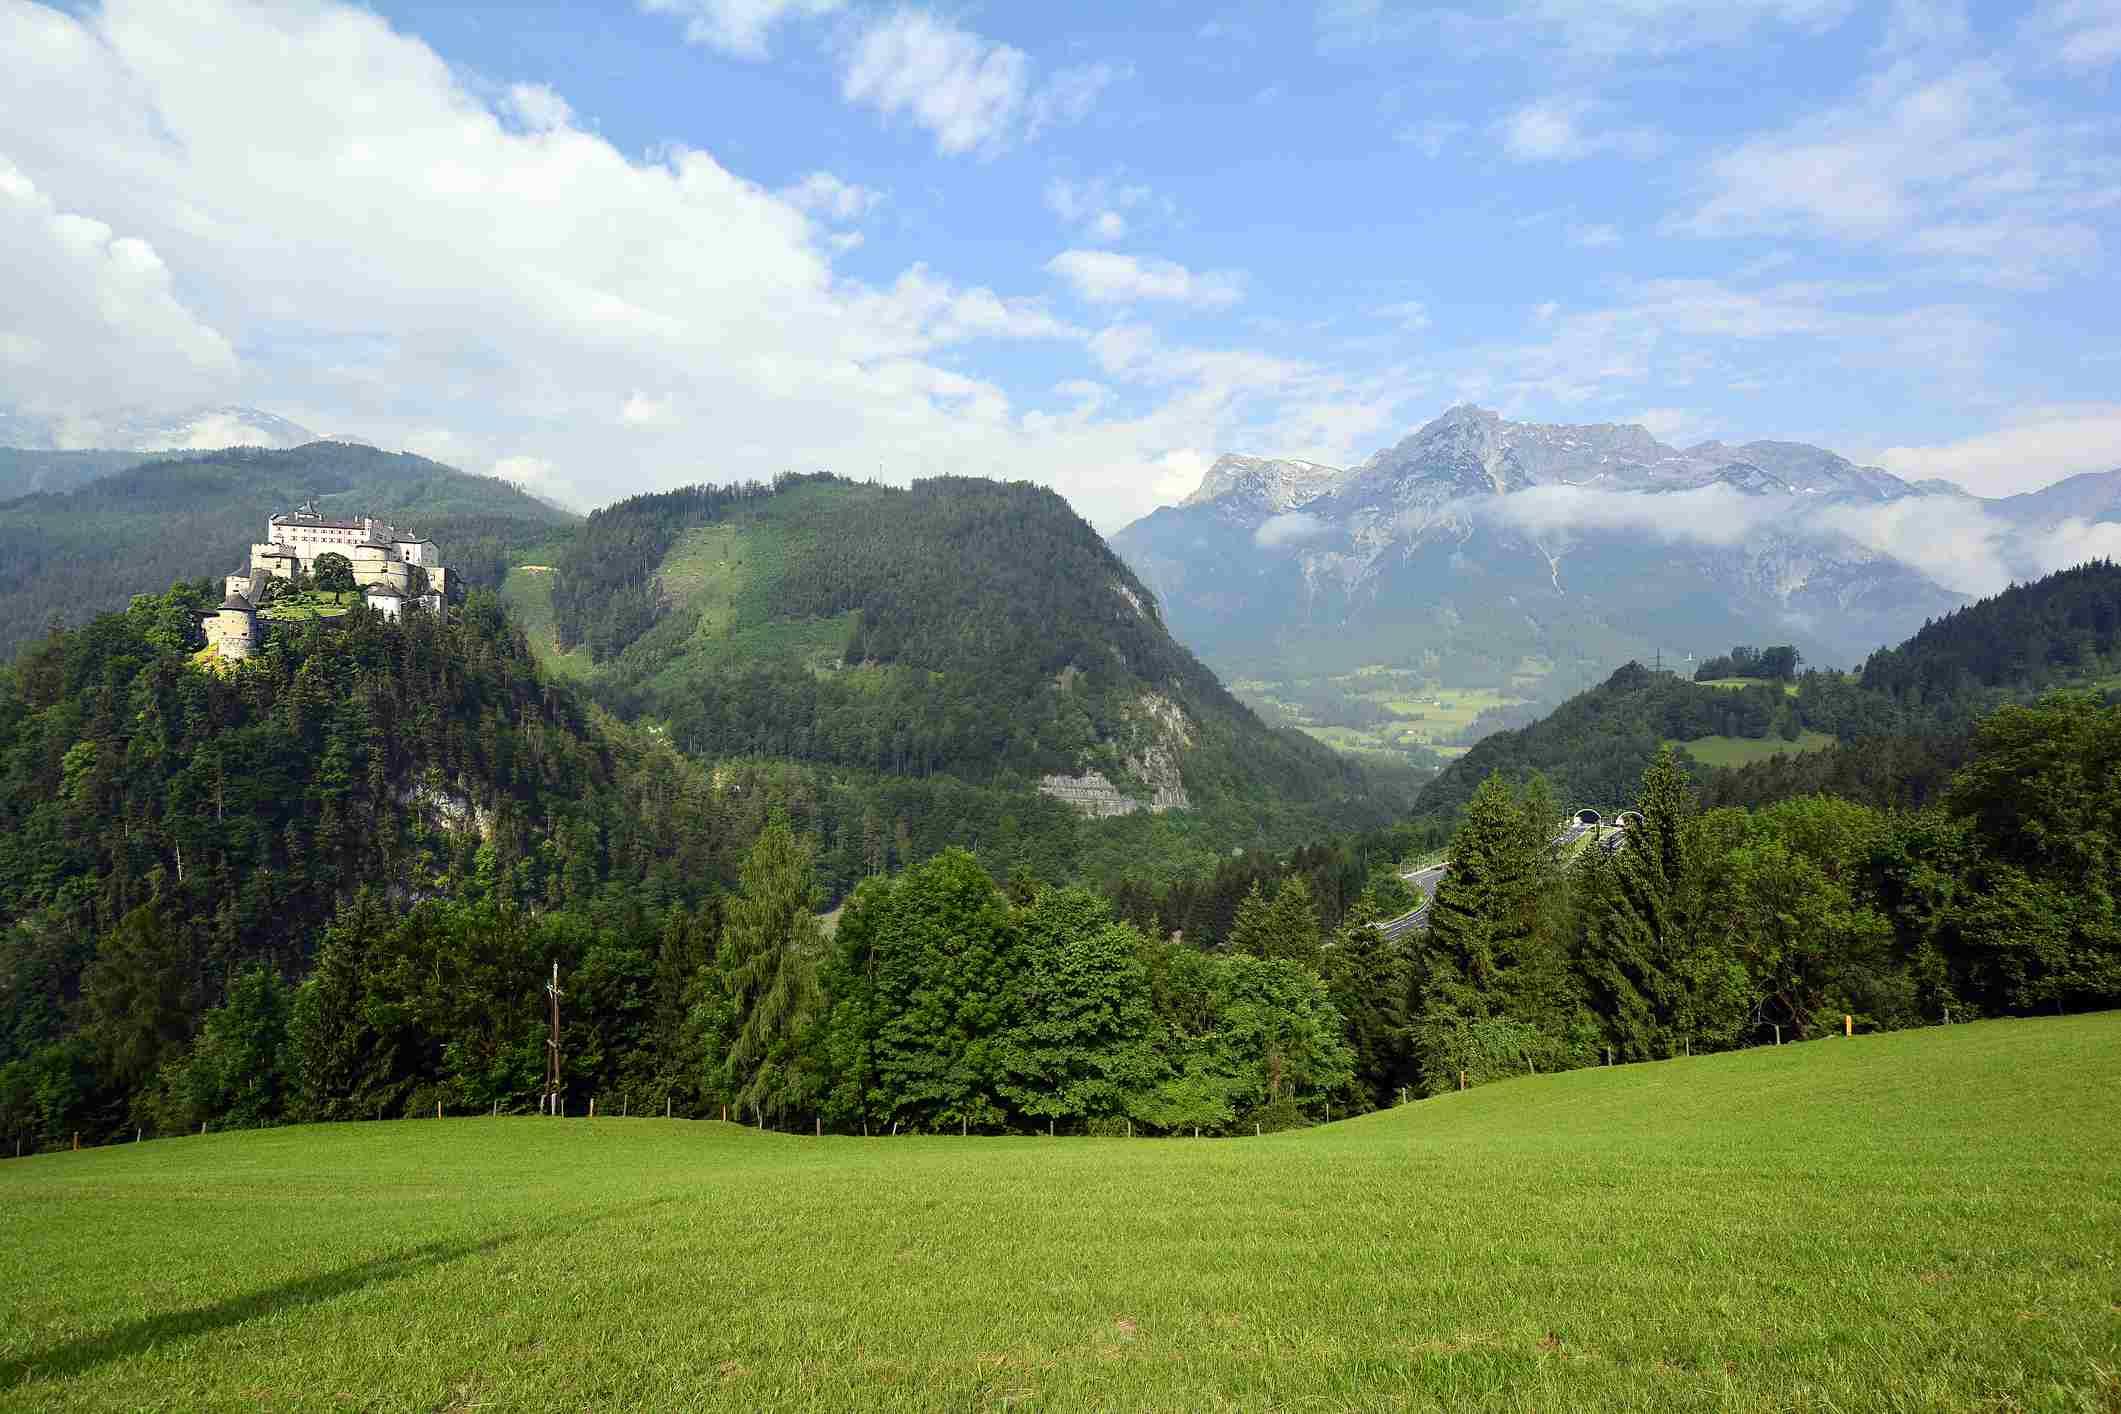 hill in werfen austria with fortress hohenwerfen in the background